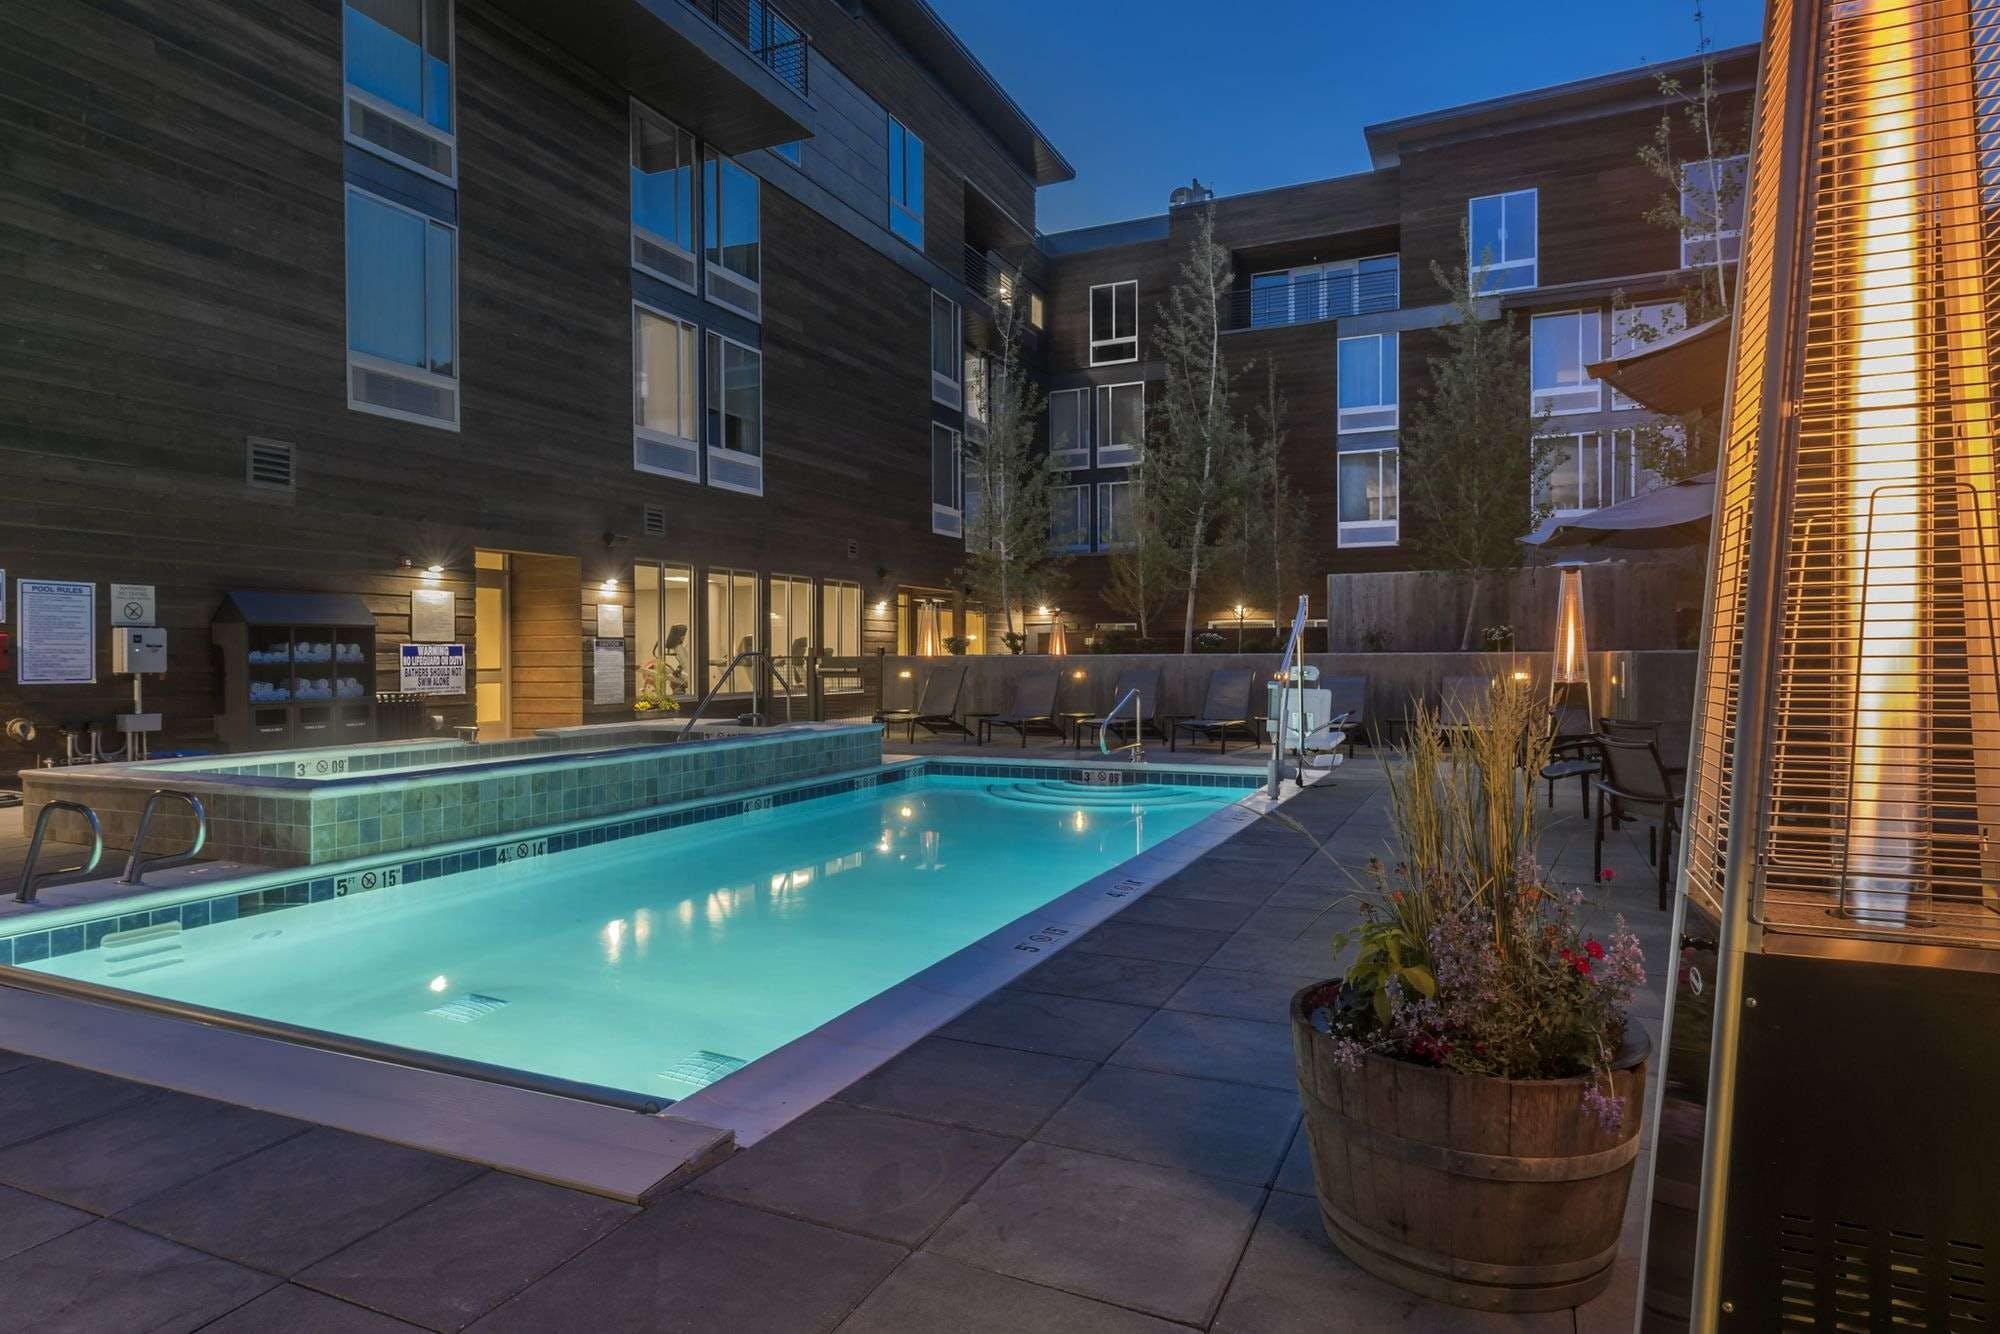 SpringHill Suites Jackson Hole